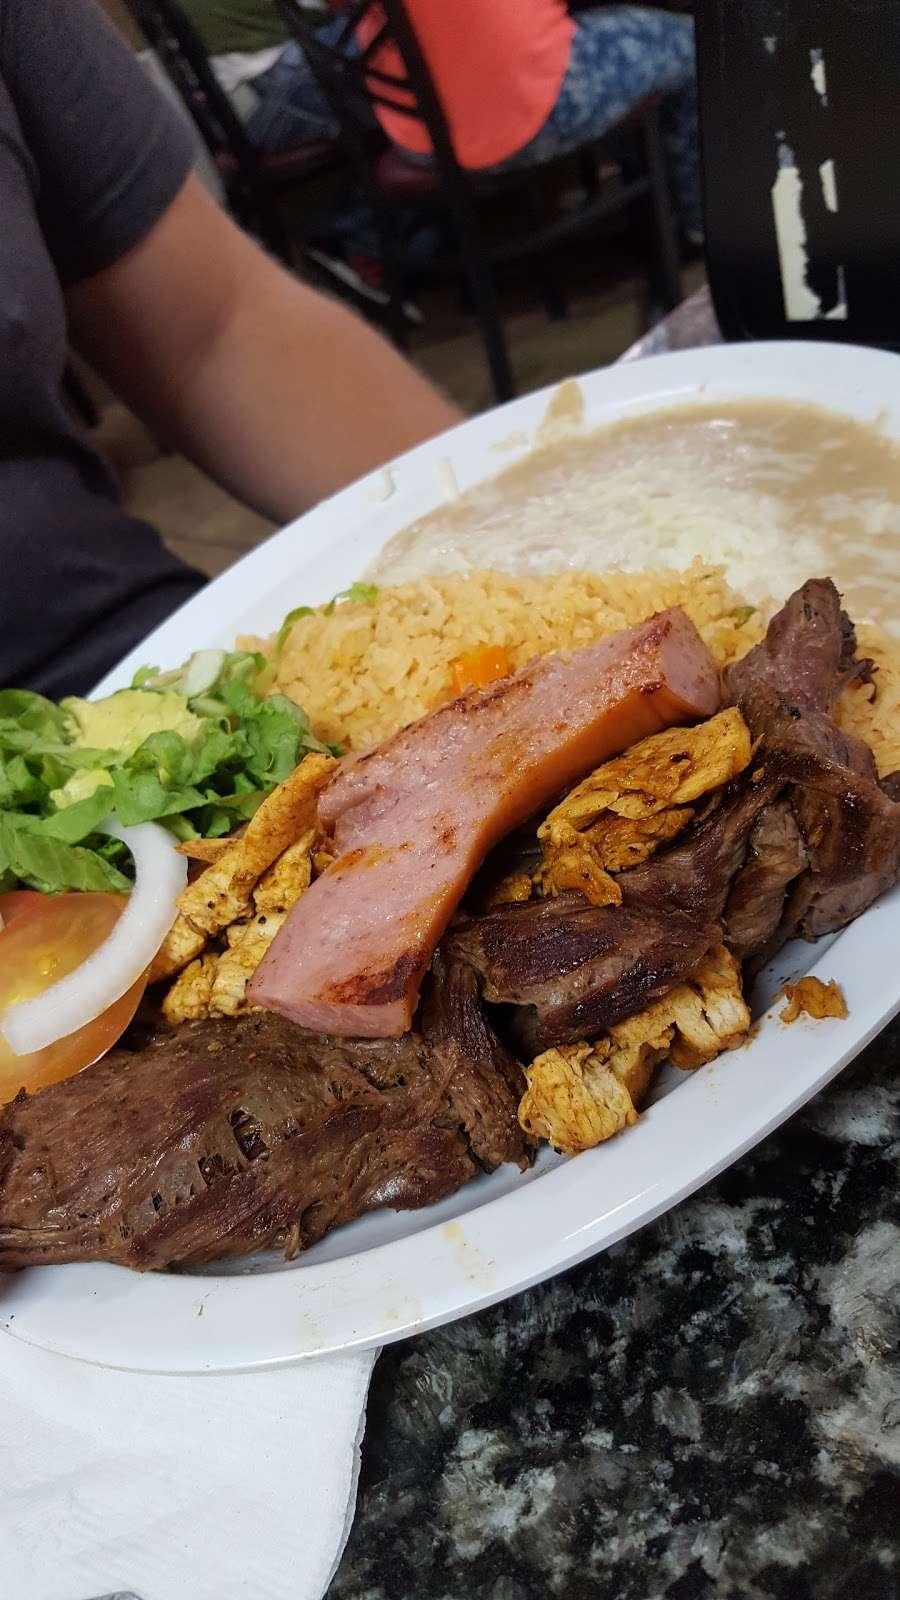 Taqueria El Torito - restaurant  | Photo 2 of 10 | Address: 1409 Central Ave, Kansas City, KS 66102, USA | Phone: (913) 233-0463